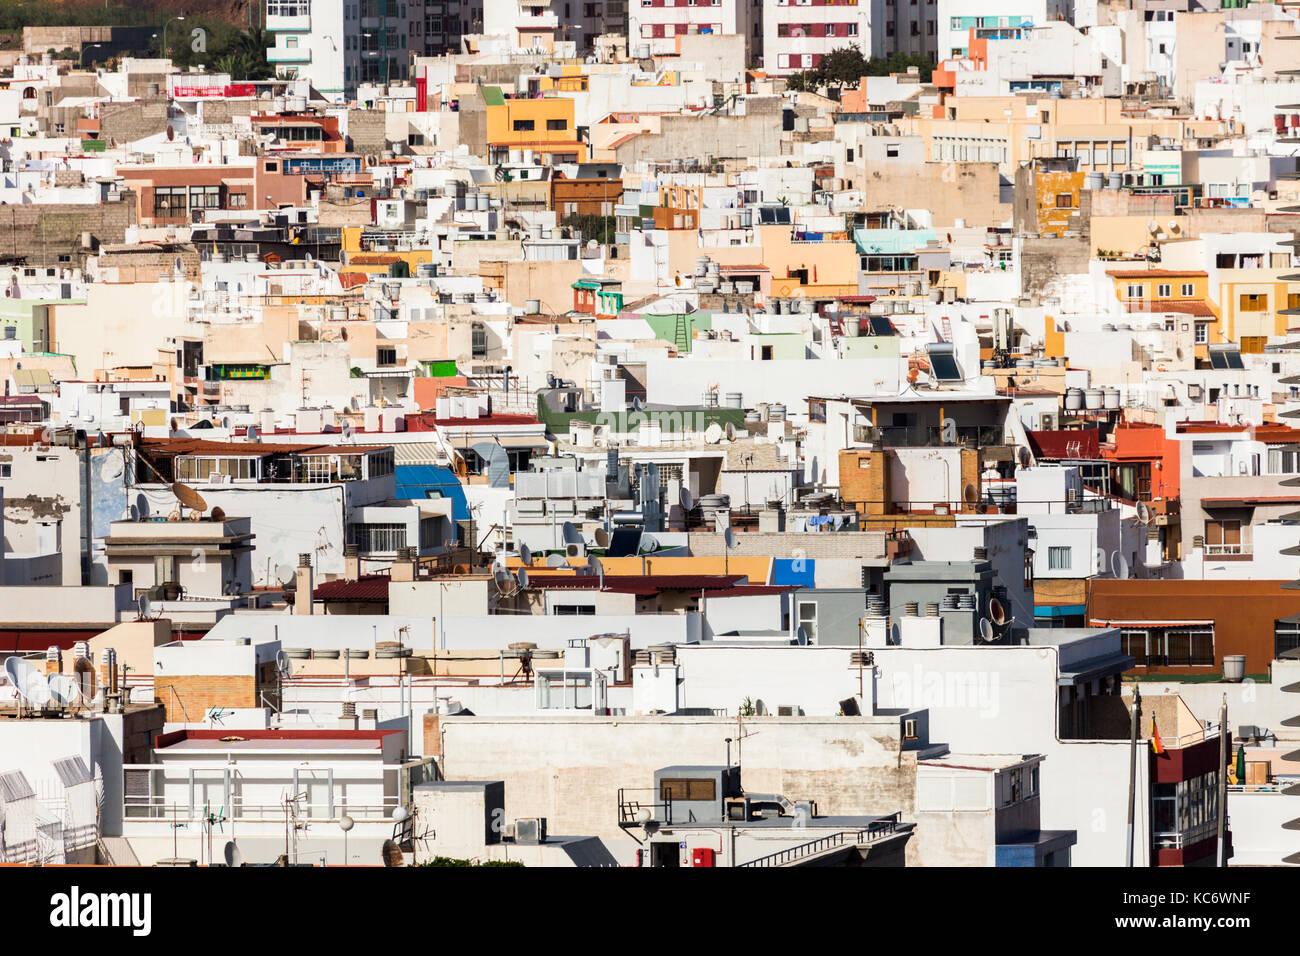 Spanien, Kanarische Inseln, Gran Canaria, Las Palmas Gebäude Exterieur Stockbild